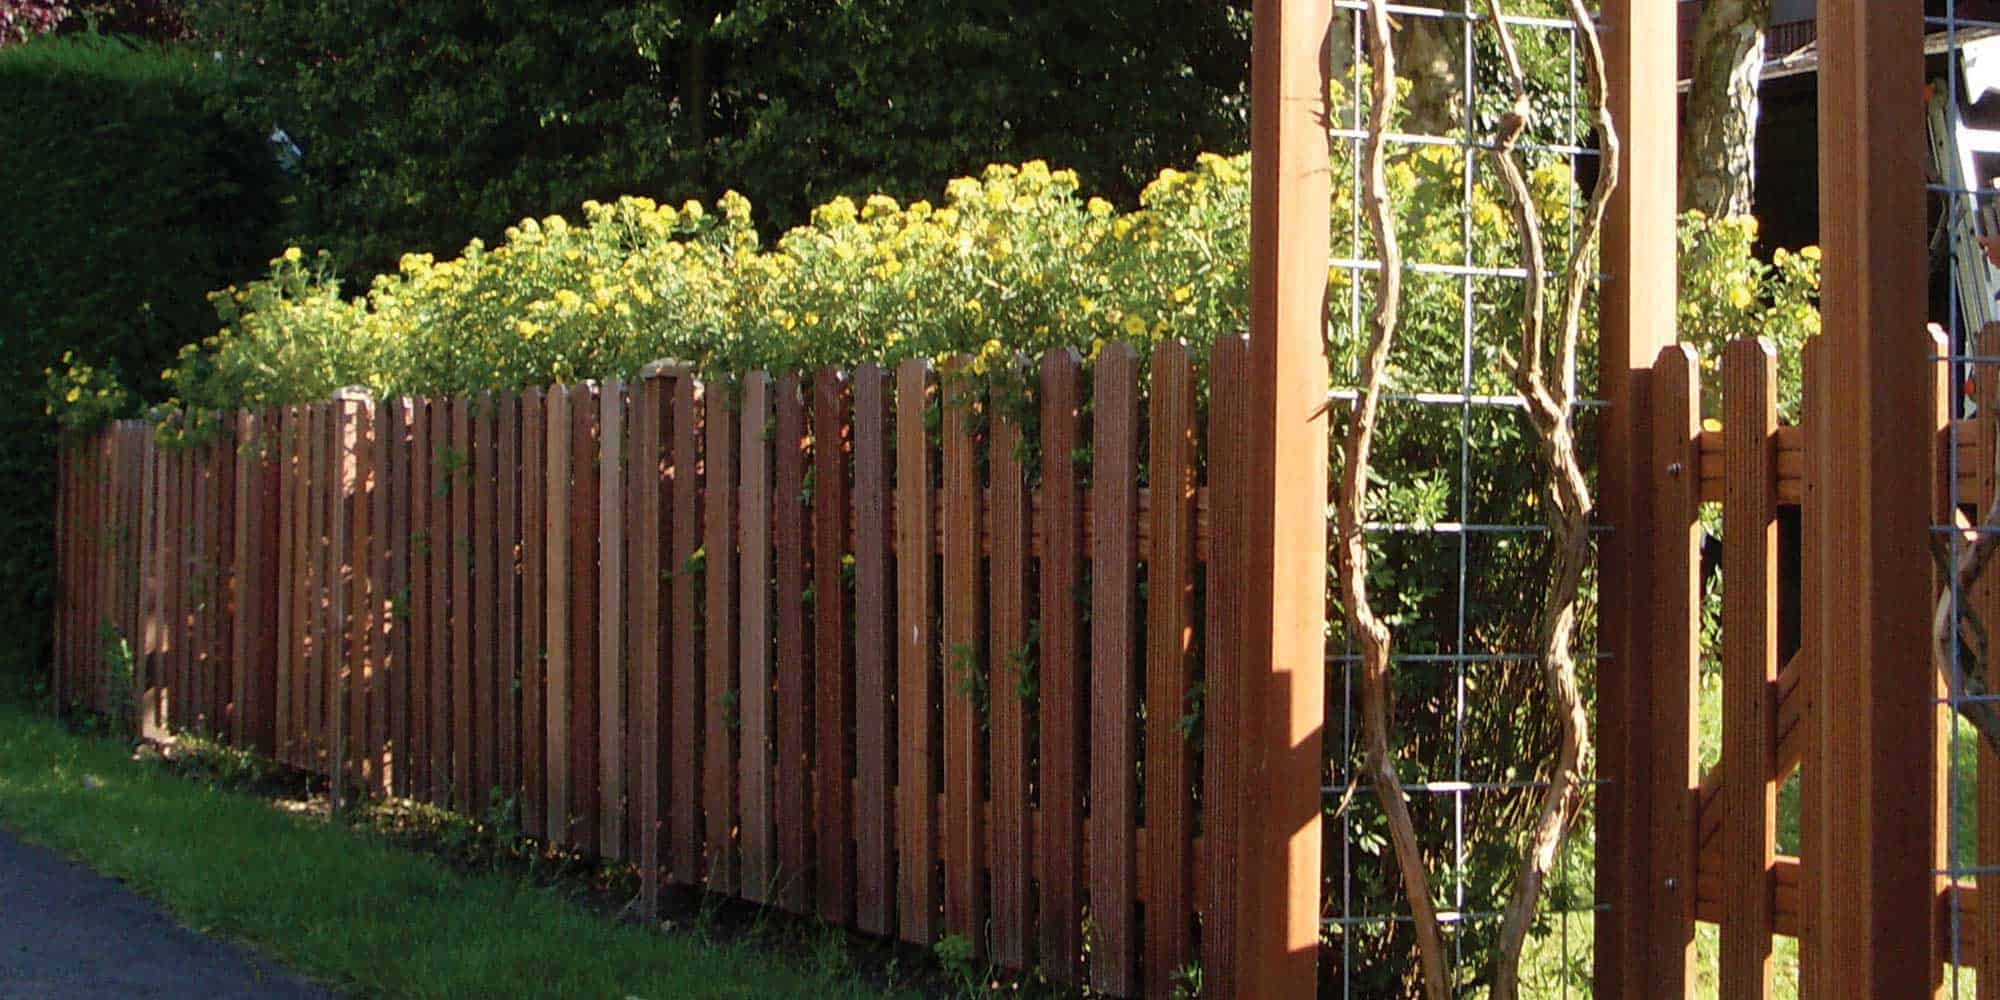 Holzzaun Kunststoffzaun • Geliefert oder fertig montiert